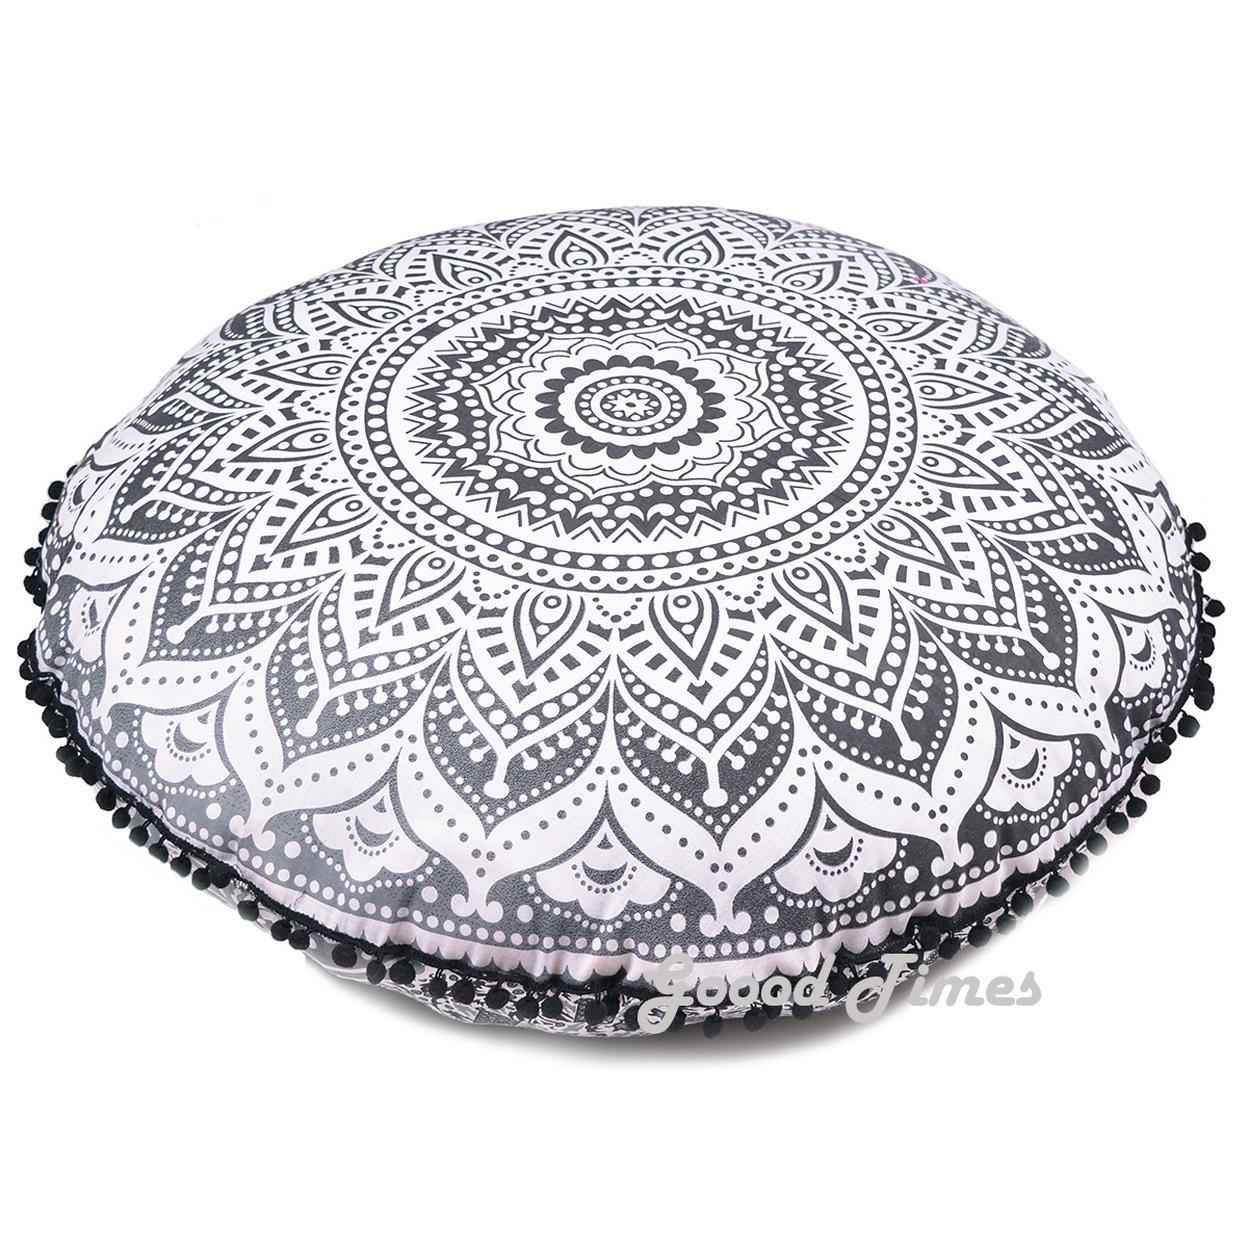 "Goood Times Black Ombre Throw Decorative Floor Pillow Cushion Cover Mandala – 32"""